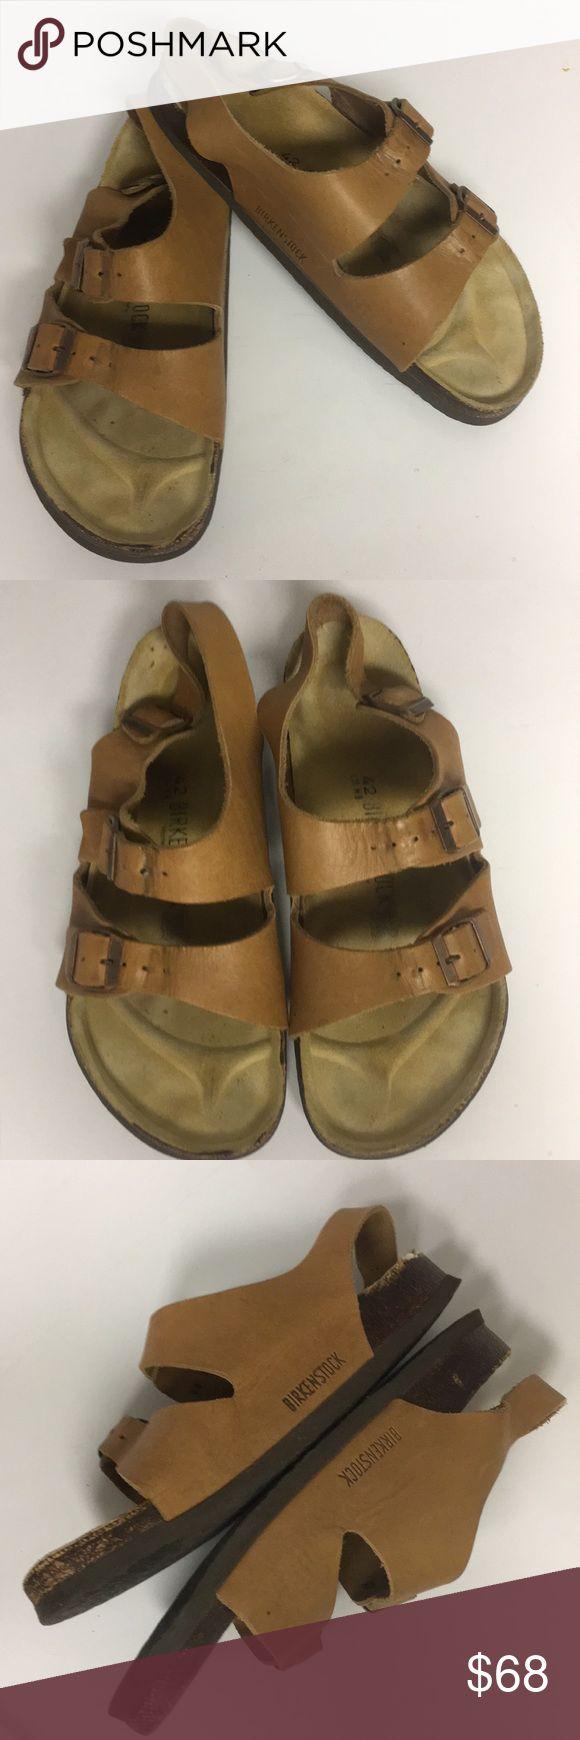 Birkenstock Tan Milano Leather Heel Strap Sandals Birkenstock Tan Milano Leather Heel Strap Sandals. The heel insole is separating a little bit in the back-please see image for details. Birkenstock Shoes Sandals & Flip-Flops #tansandalsheels